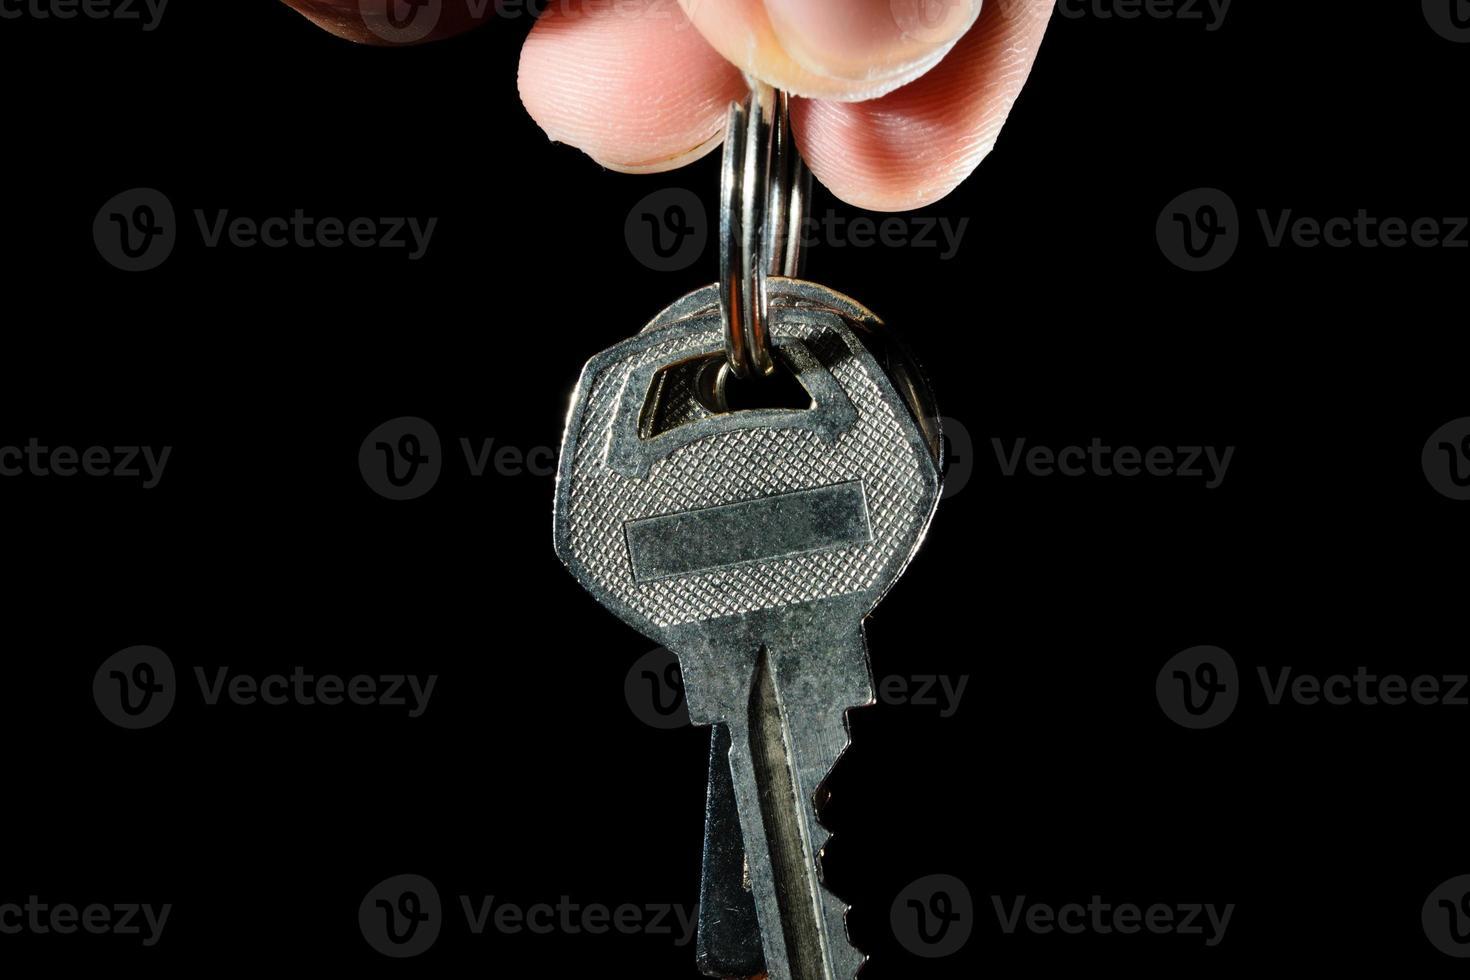 The Key photo